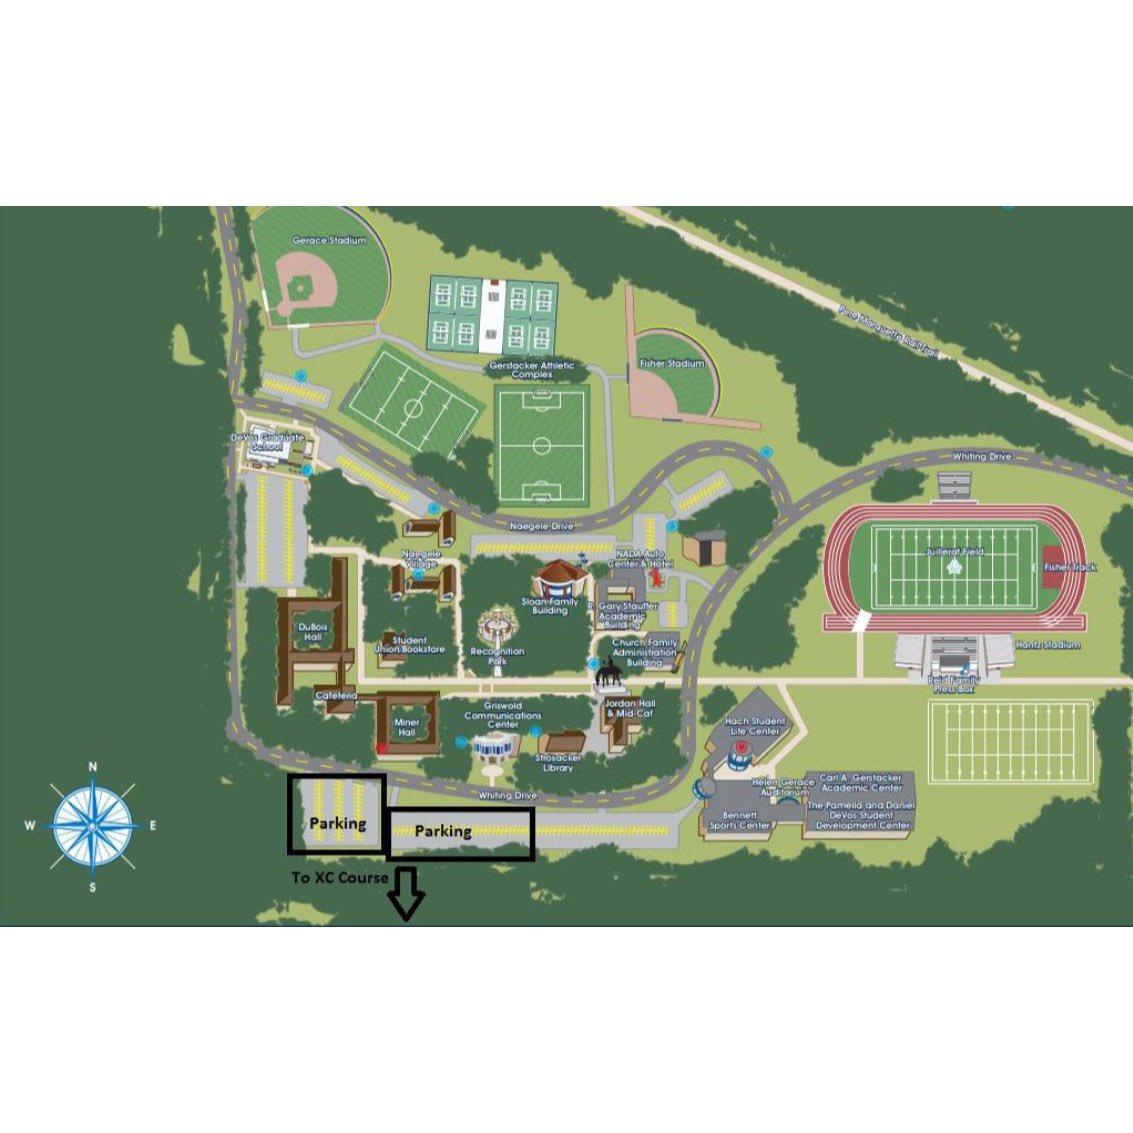 northwood university campus map Northwood University Alumni On Twitter We Re Looking Forward To northwood university campus map